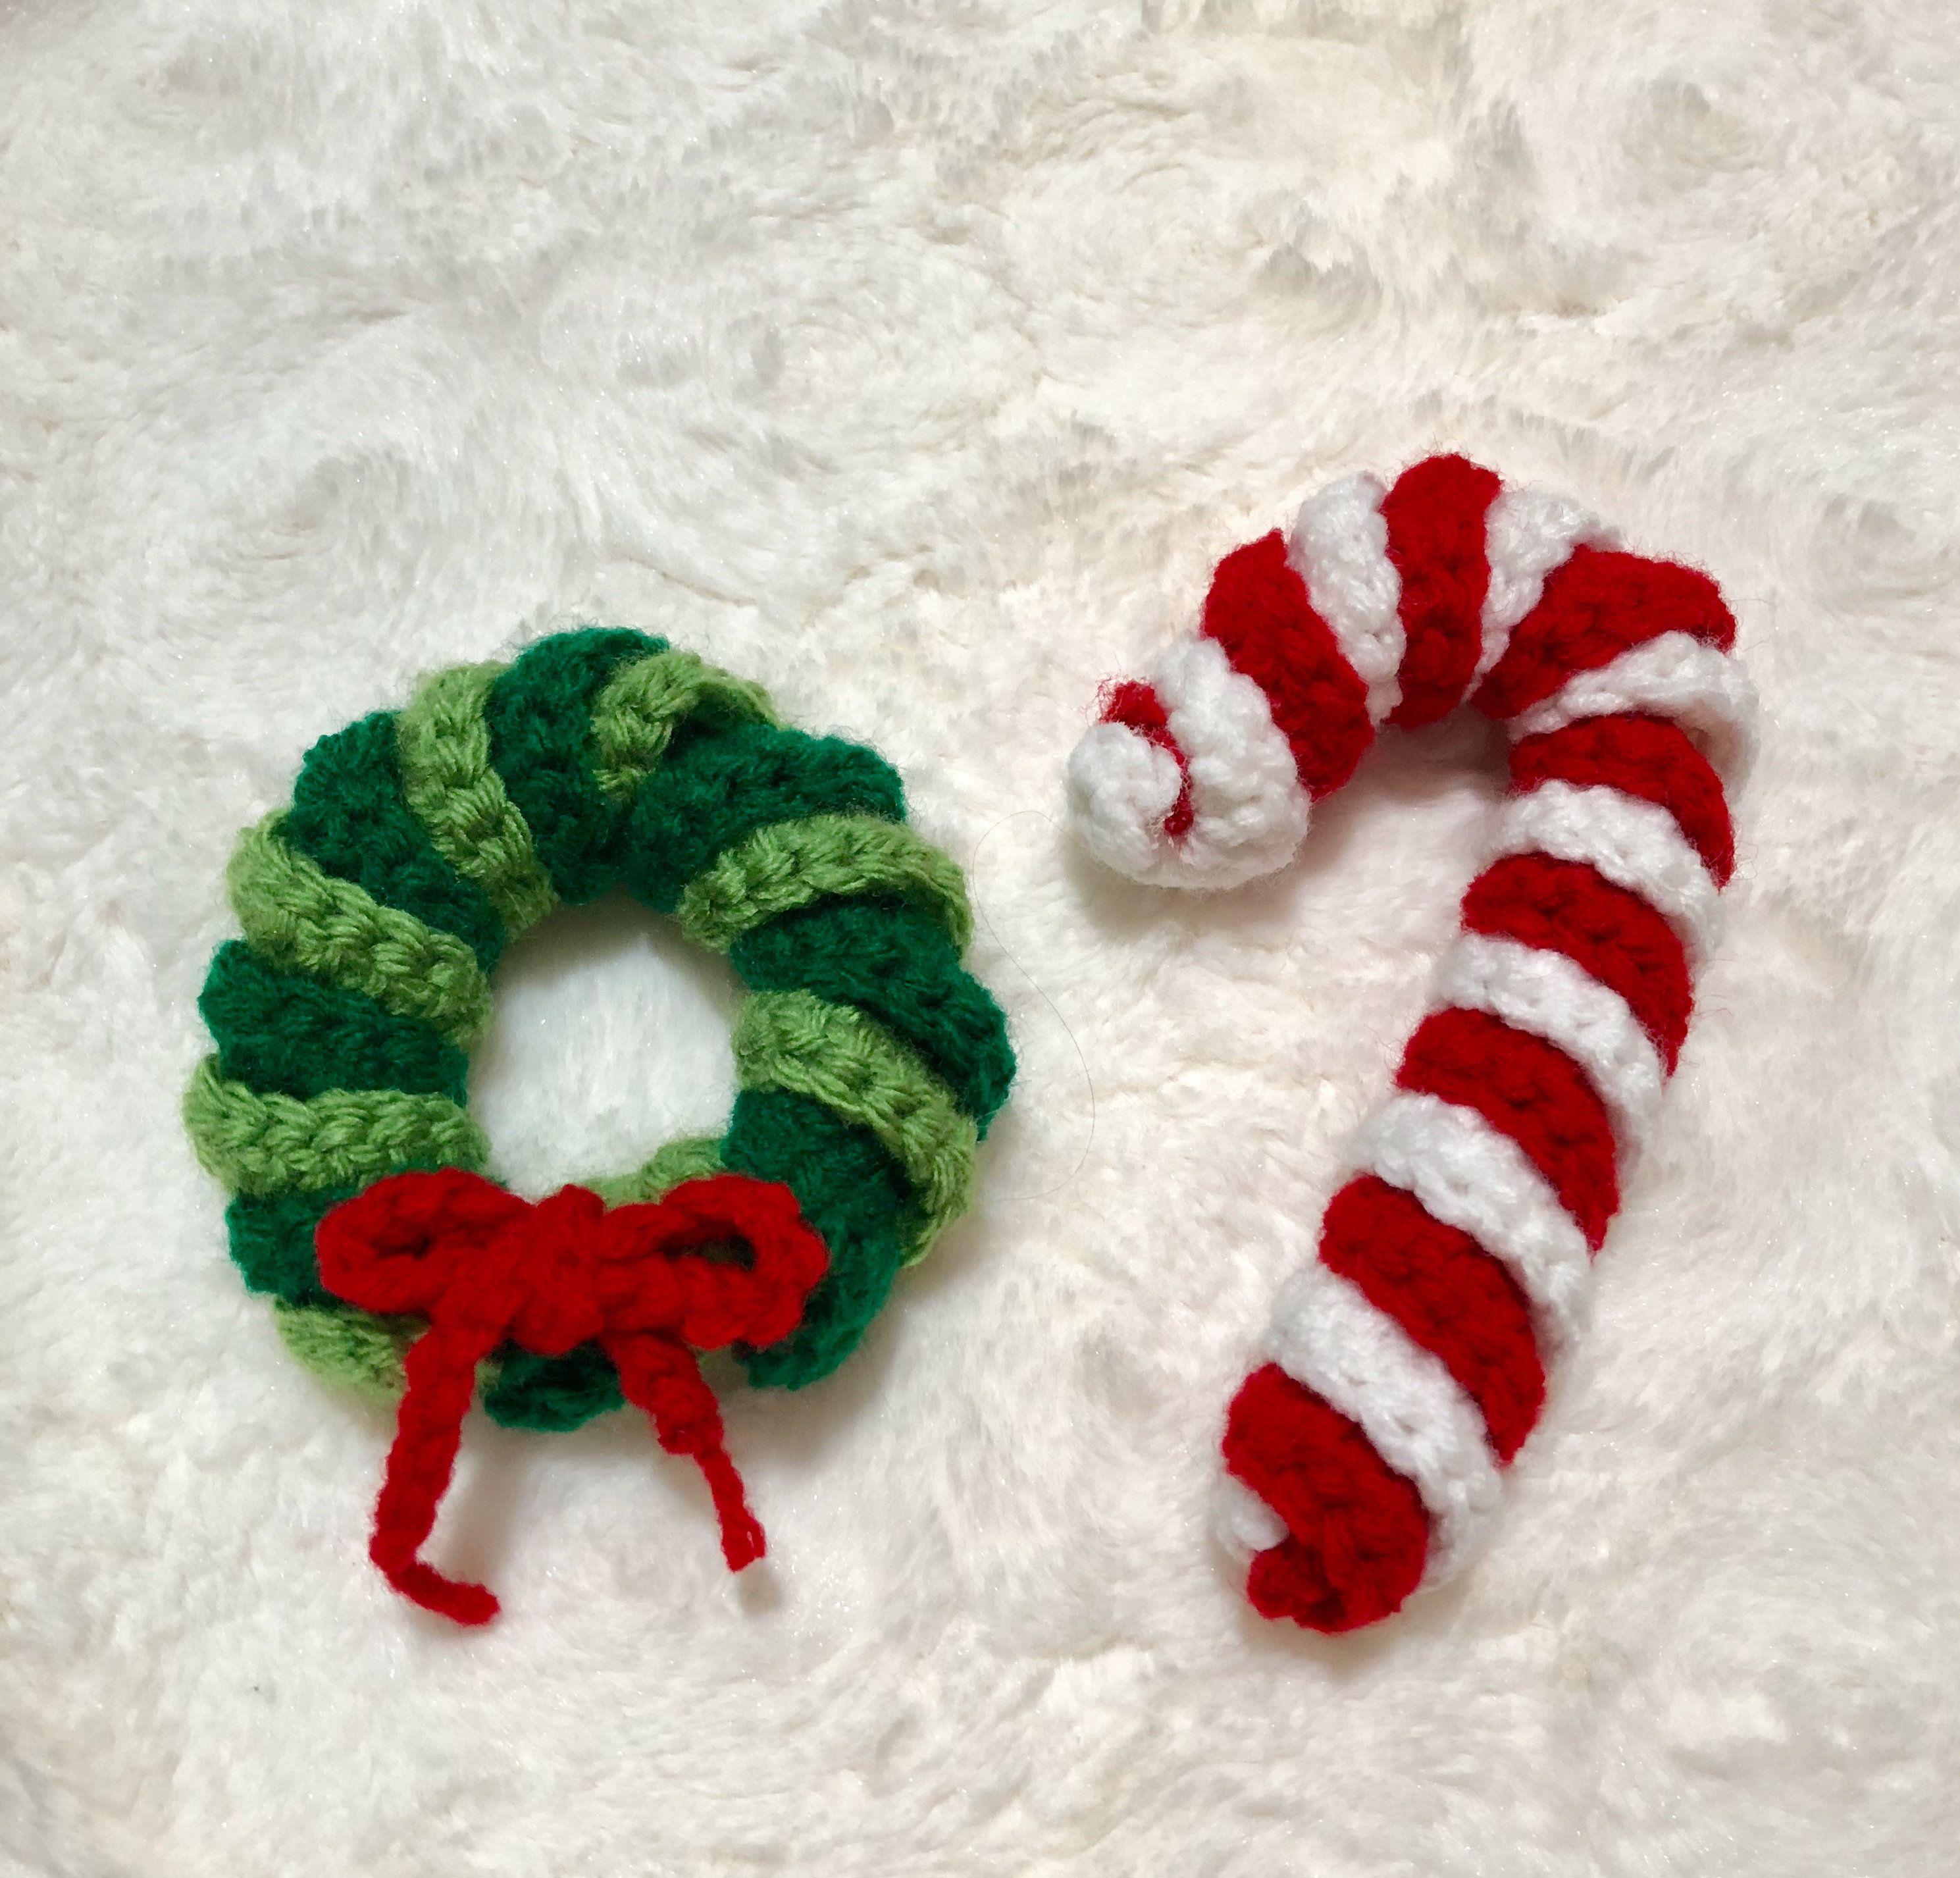 Crochet Christmas Ornaments Crochet Wreath Crochet Candy Cane Decoraciones Navidenas Crochet Christmas Ornaments Christmas Crochet Felt Christmas Ornaments